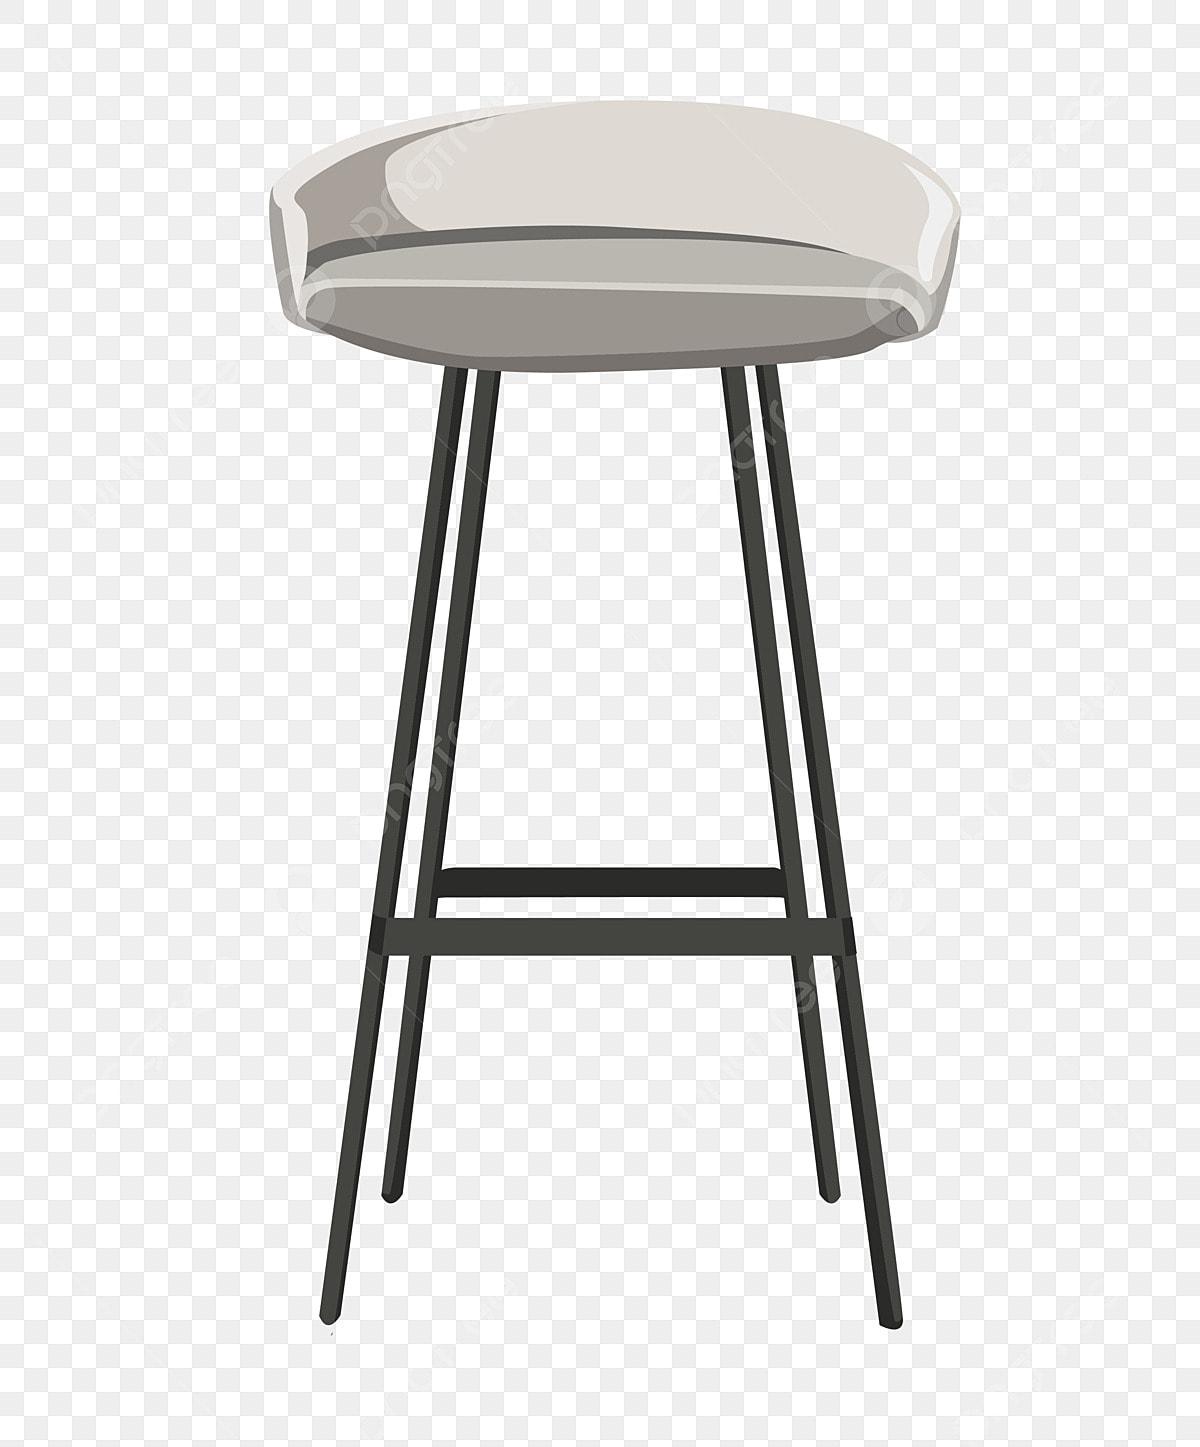 Super Furniture Chair Cartoon Illustration Furniture Chairs Alphanode Cool Chair Designs And Ideas Alphanodeonline